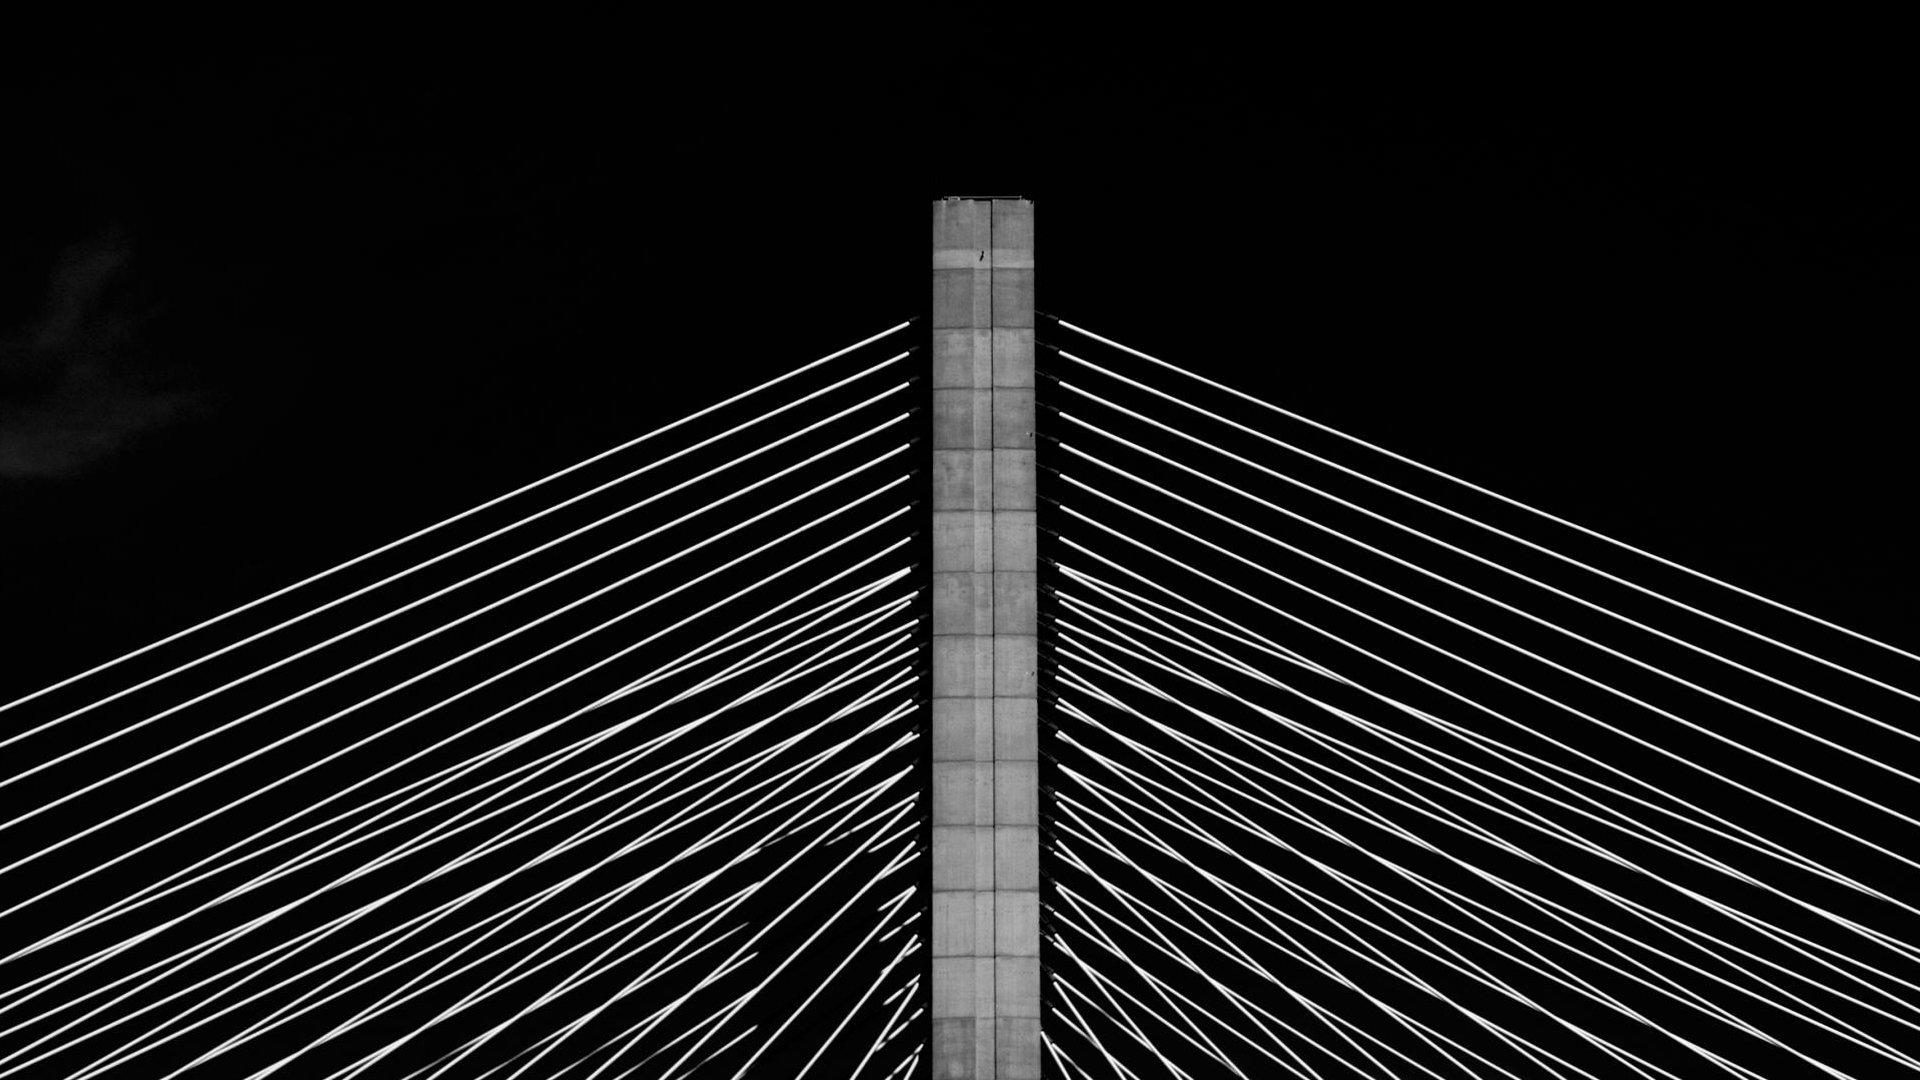 Vasco Da Gama Bridge Hd Wallpaper Background Image 1920x1080